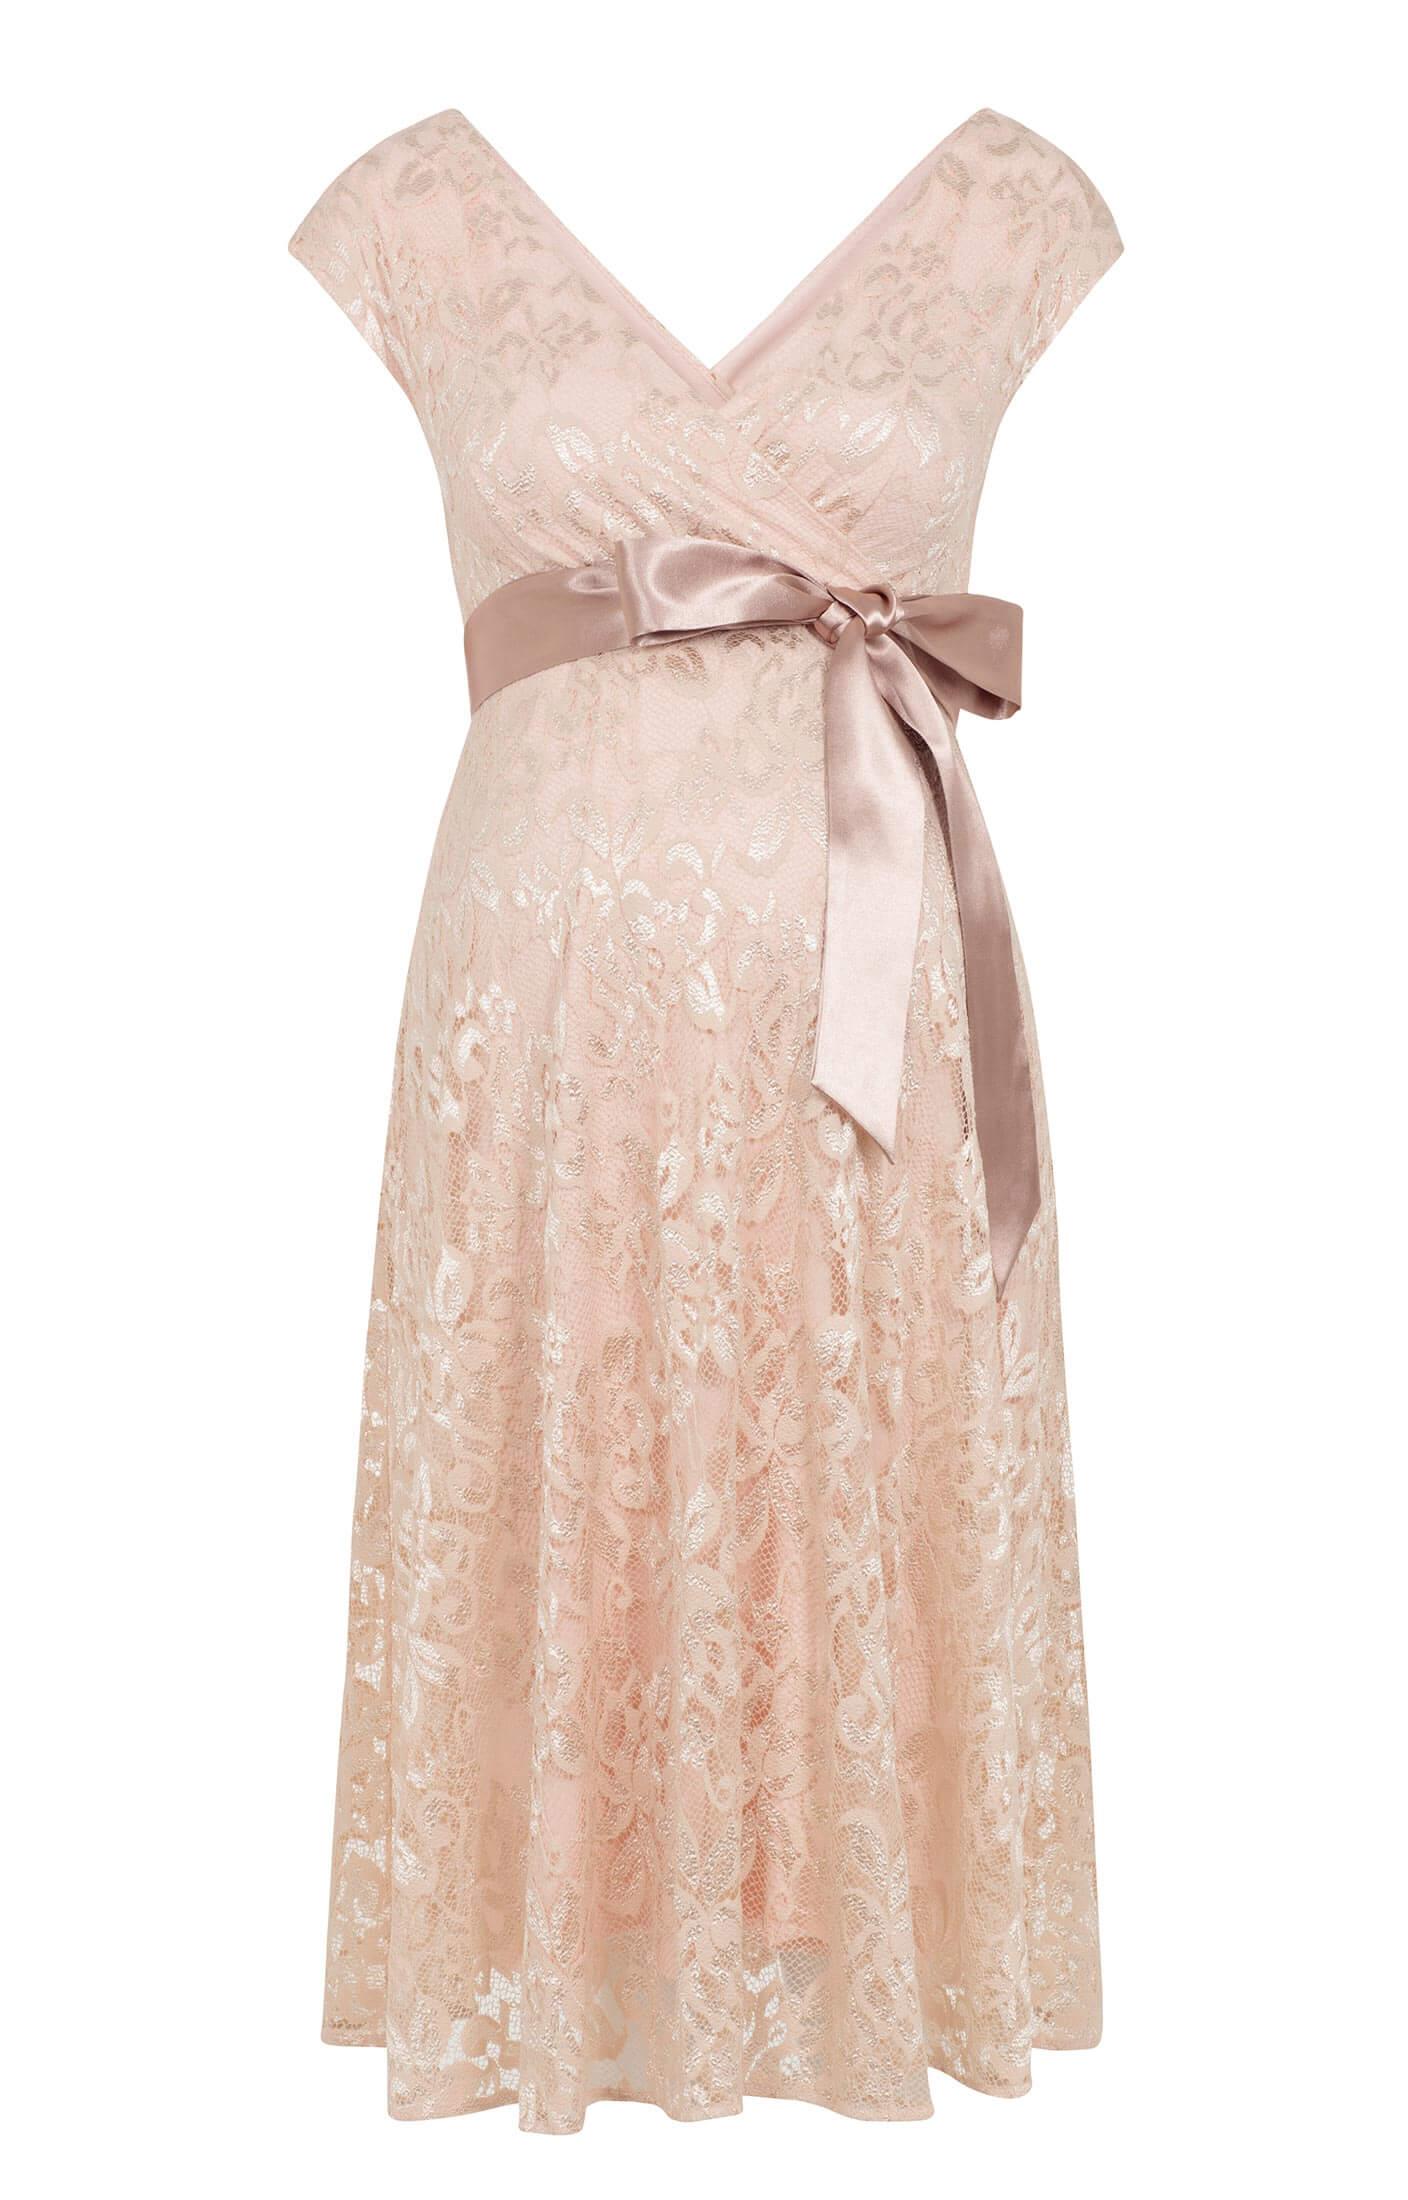 Orla maternity lace dress pearl blush maternity wedding for Maternity lace wedding dresses